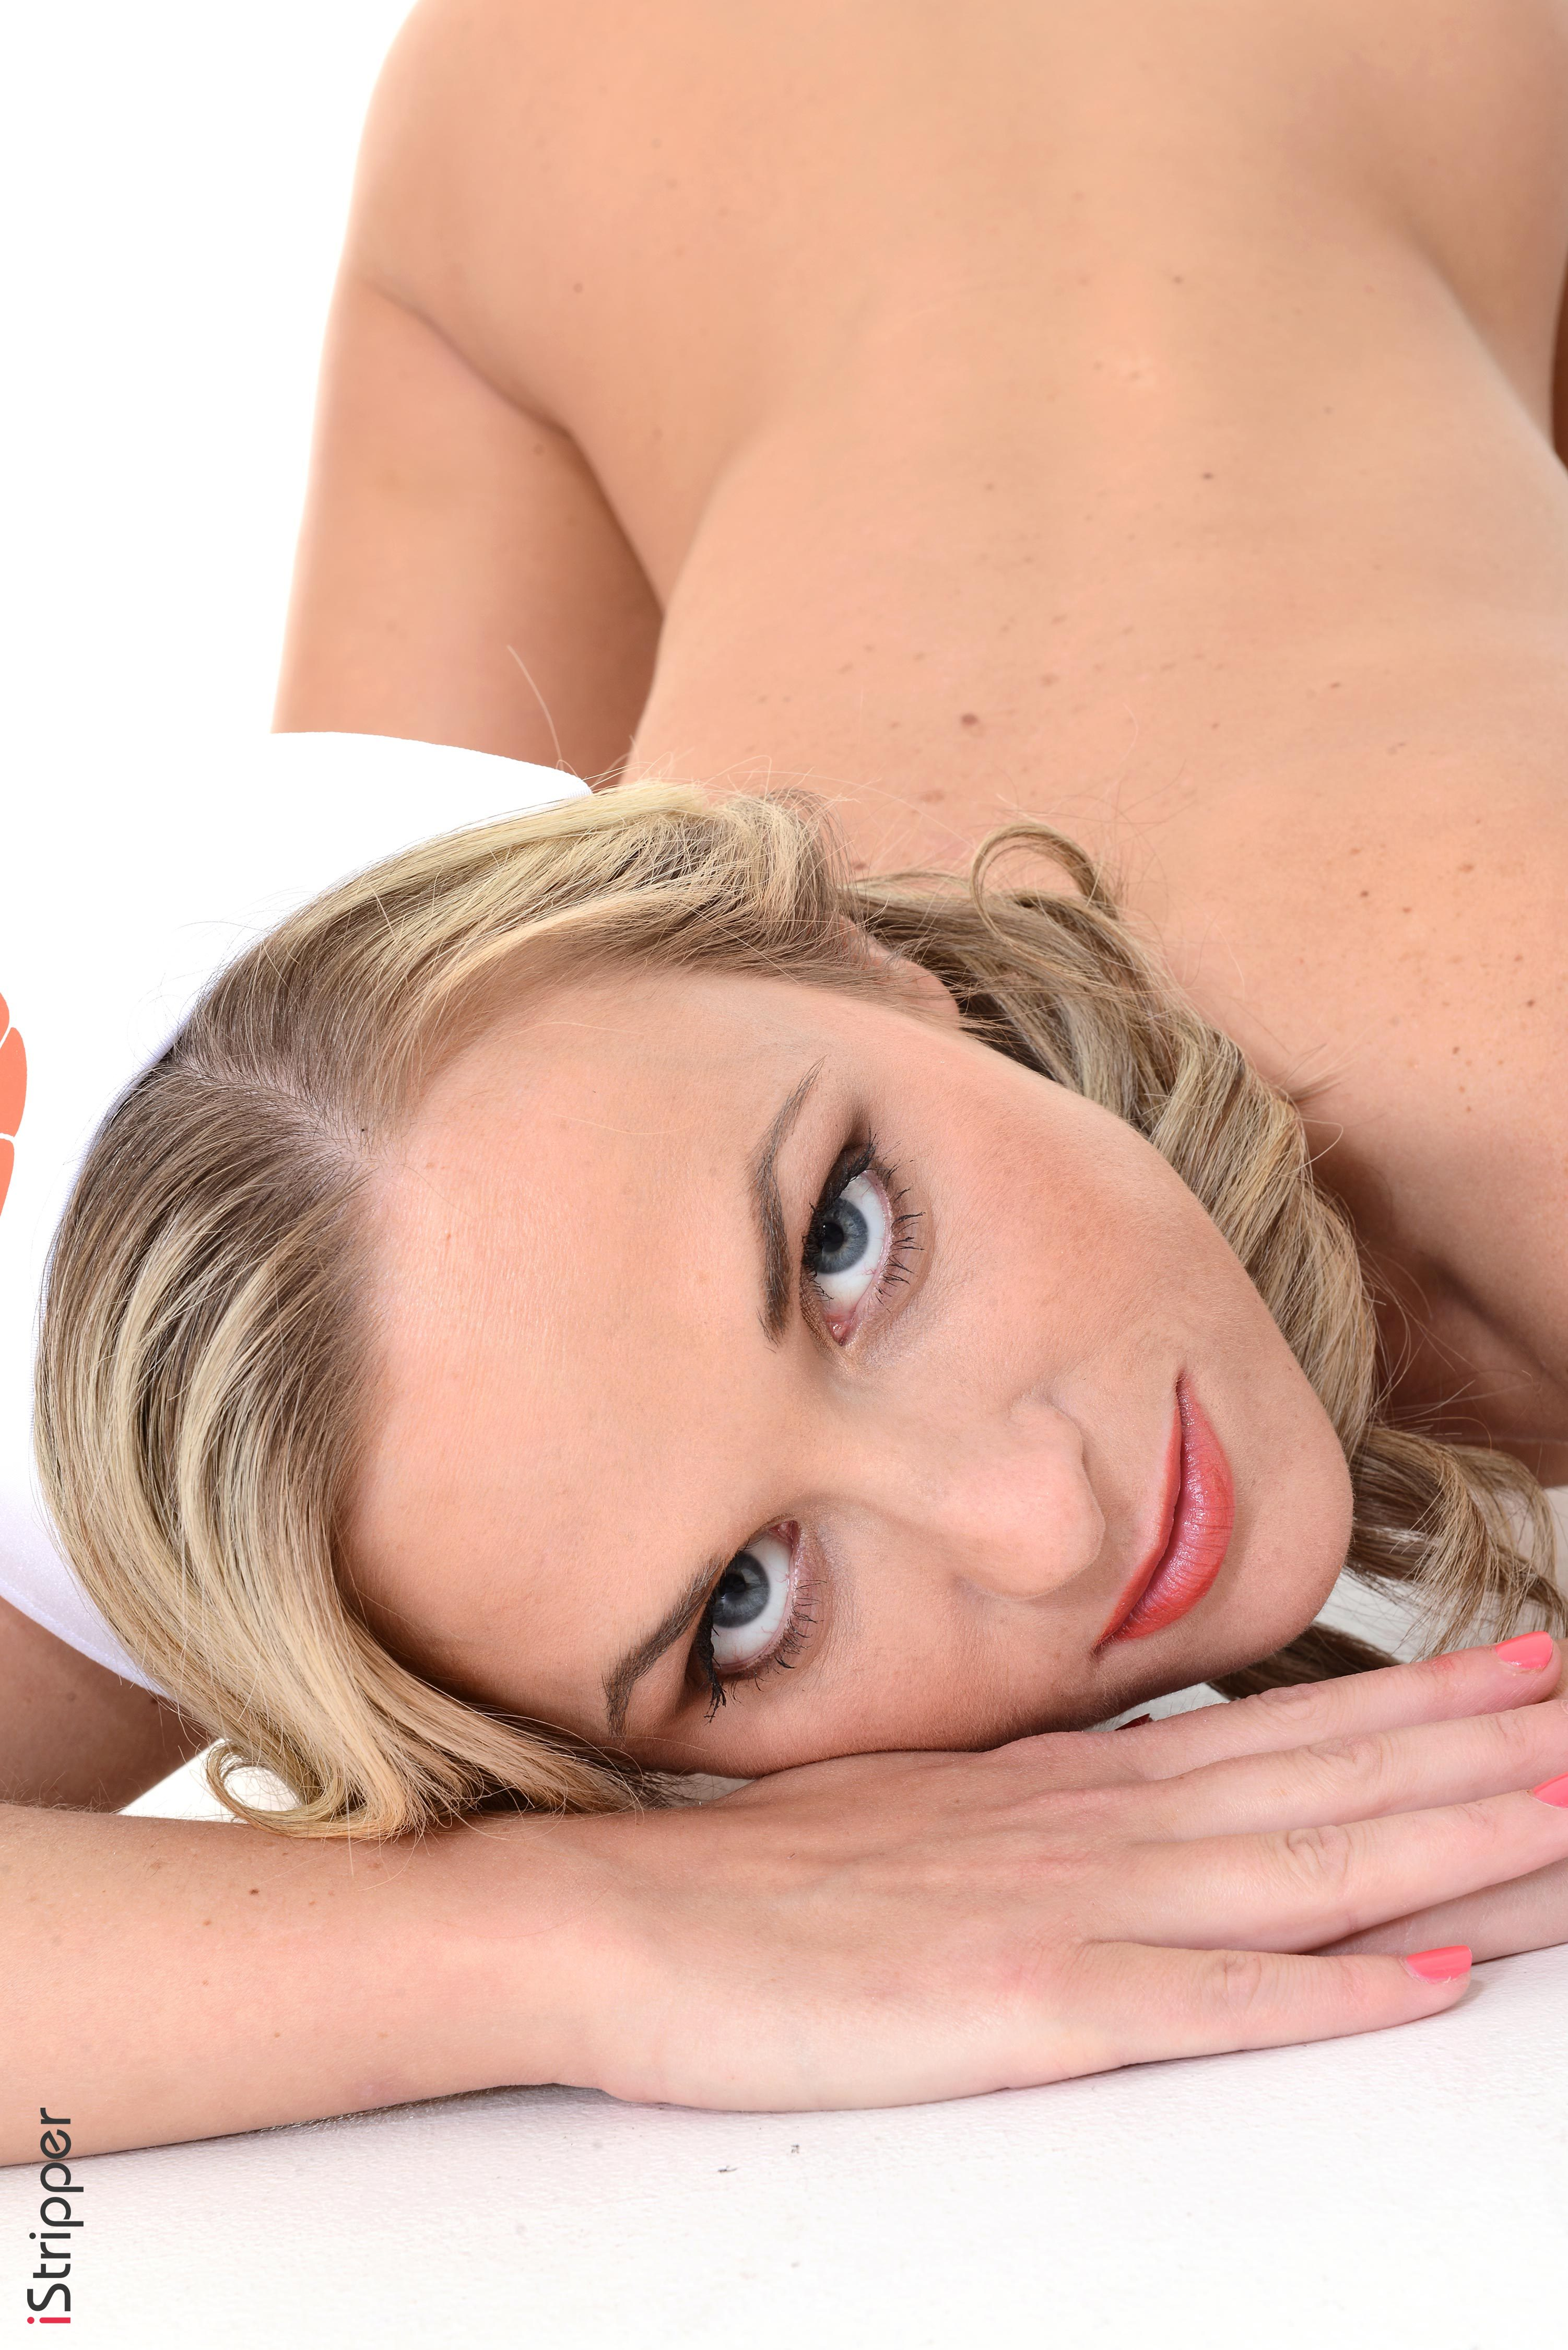 harley quinn desktop stripper